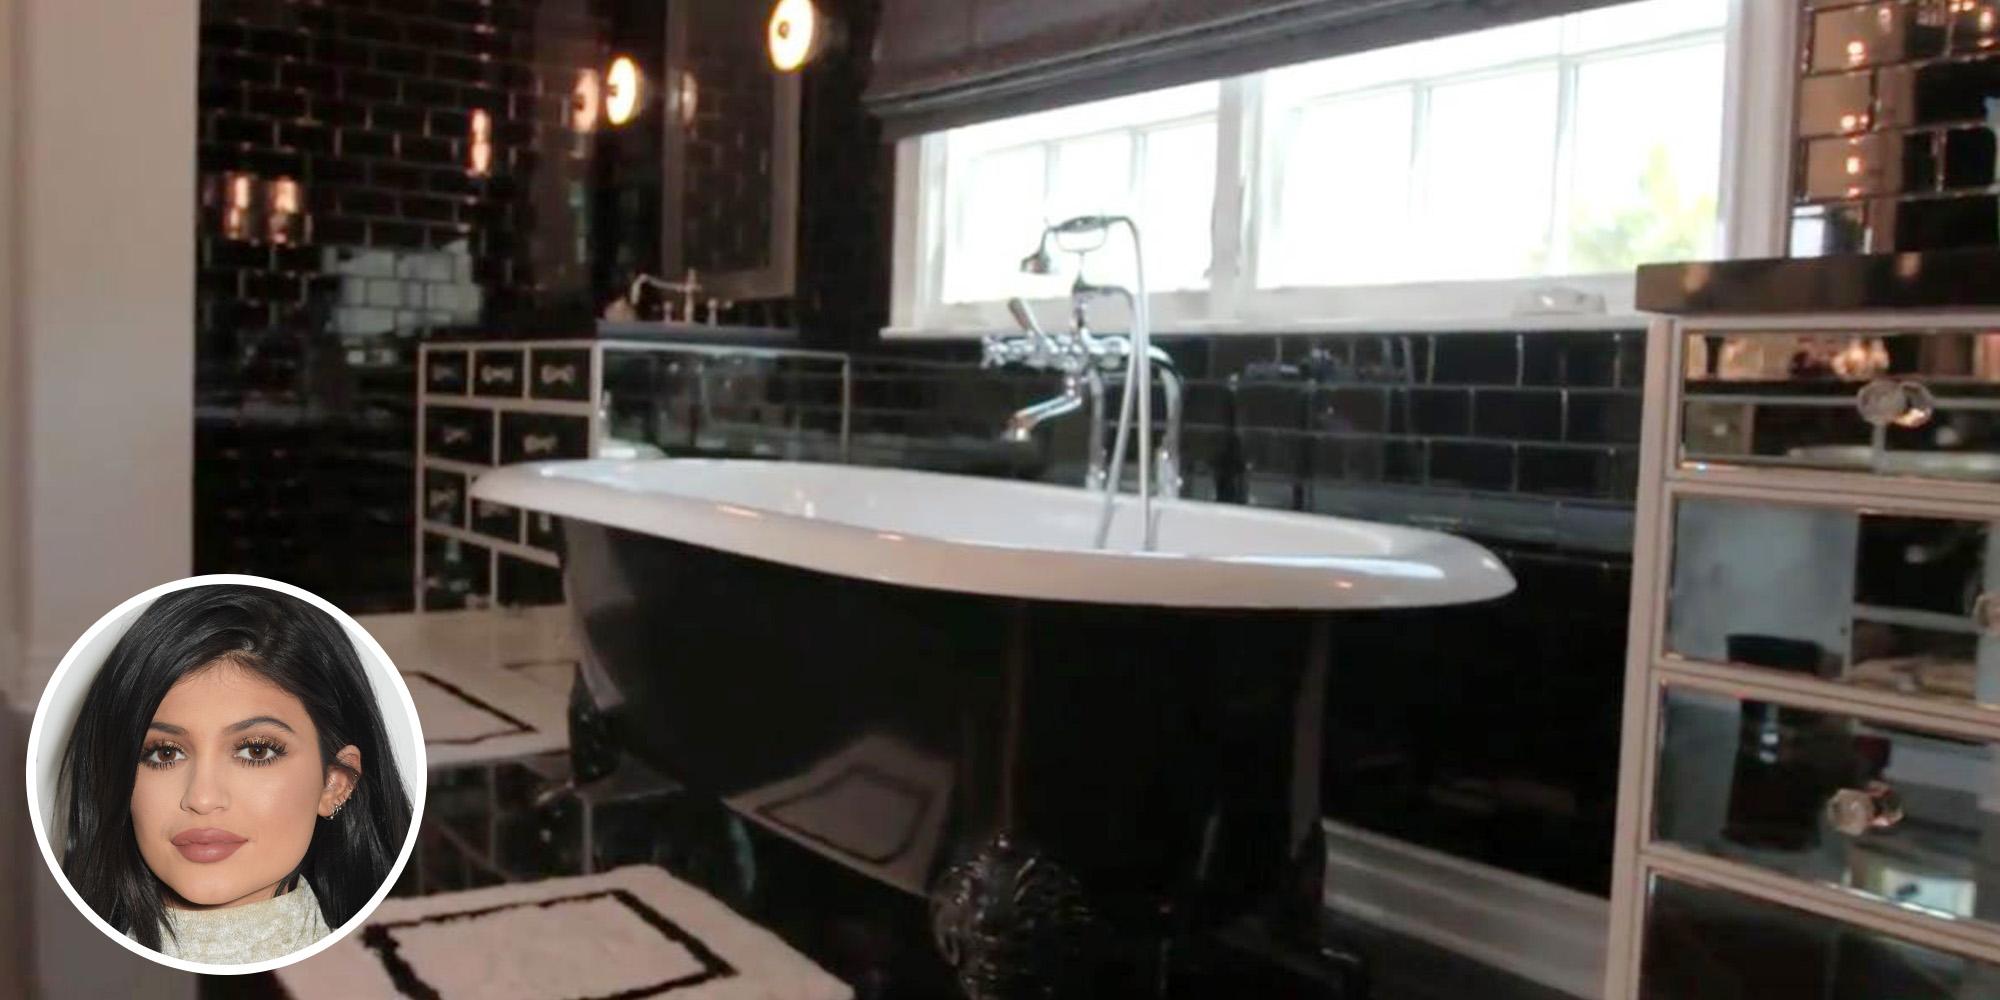 Celebrity bathrooms most insane celebrity bathrooms for Kylie jenner bathroom photos